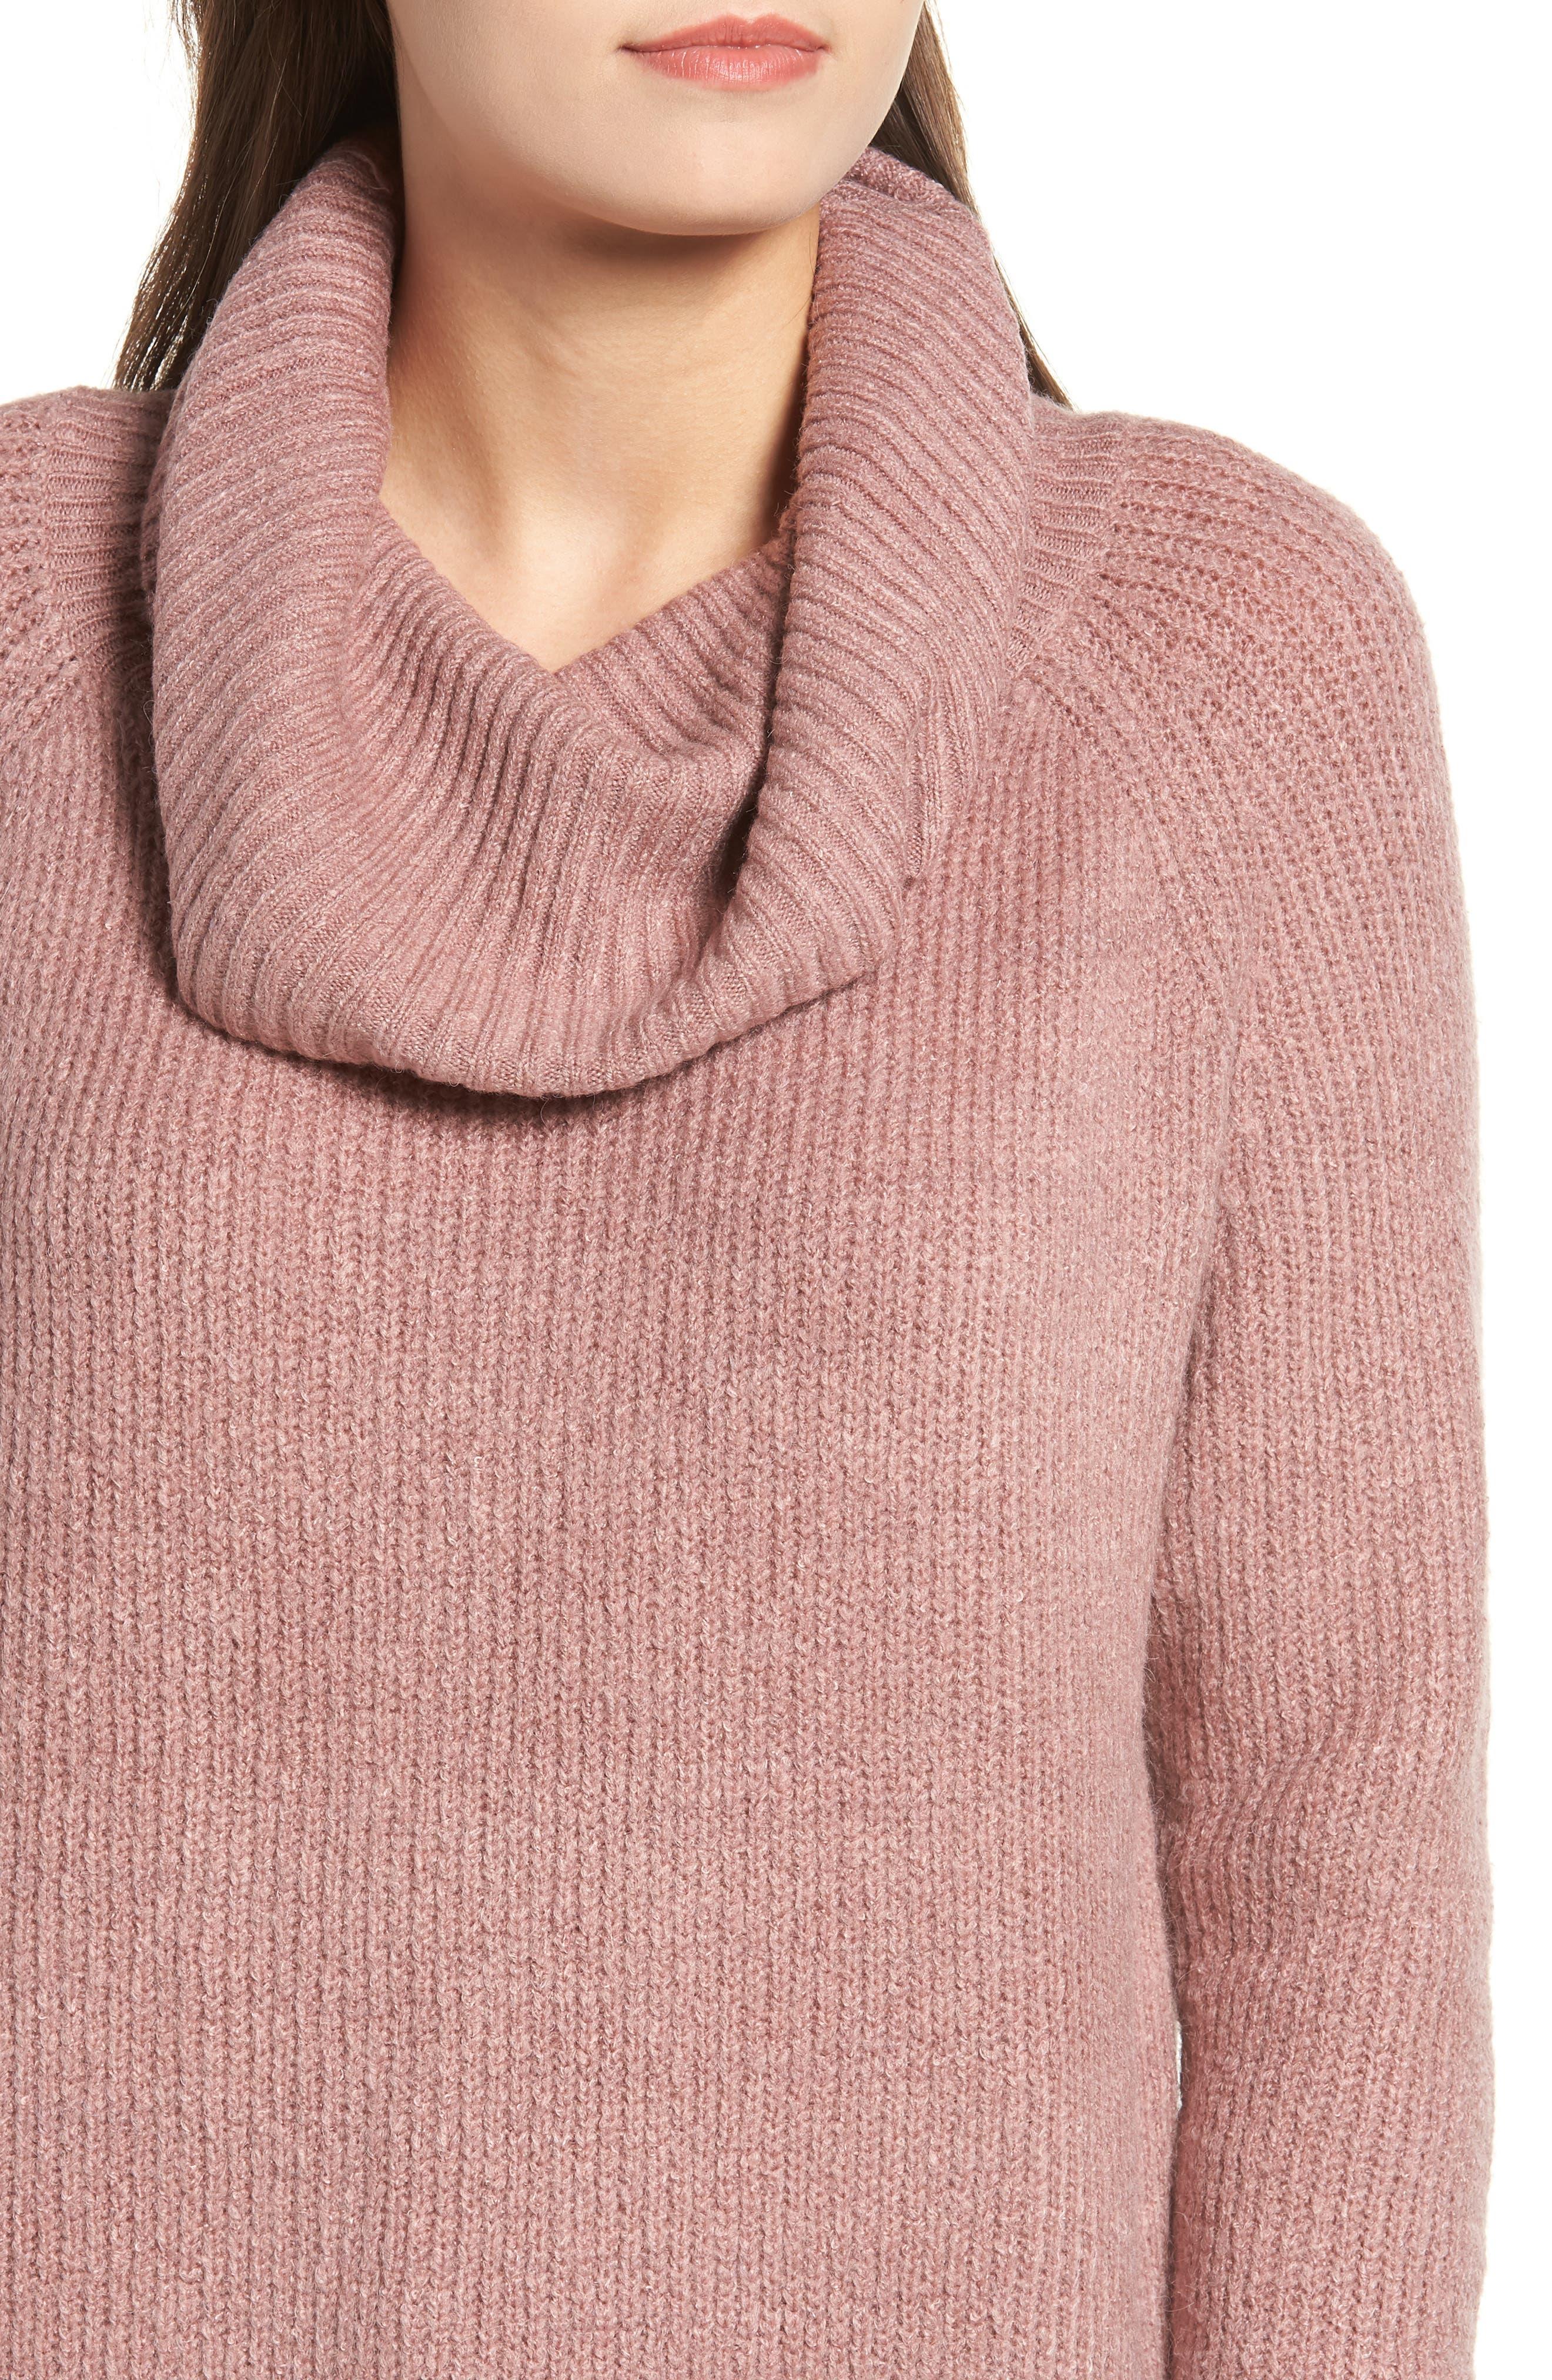 Cowl Neck Sweater,                             Alternate thumbnail 4, color,                             500